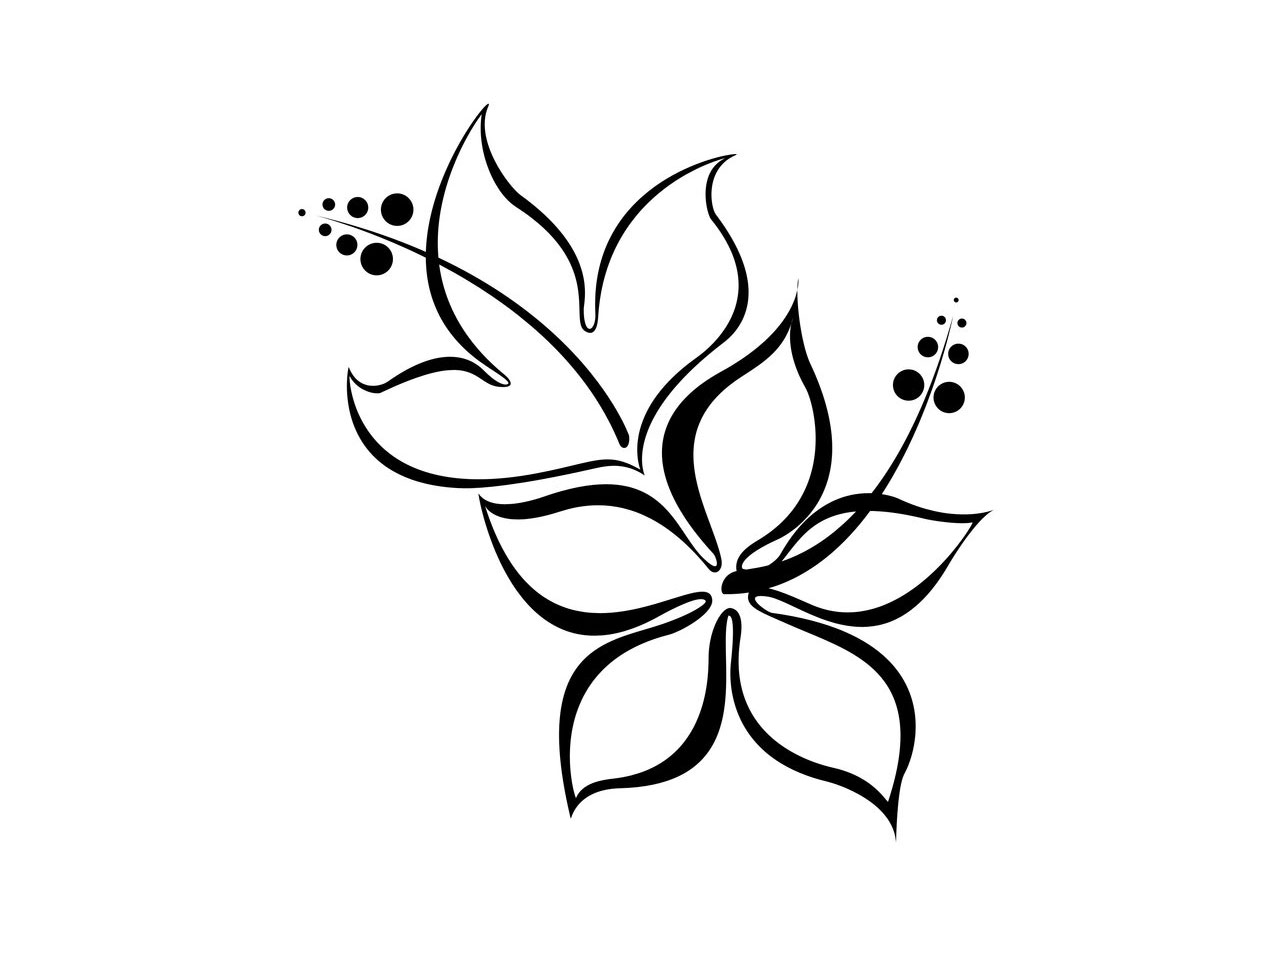 1280x960 Drawing A Simple Flower Free Simple Line Drawings Vector Flower